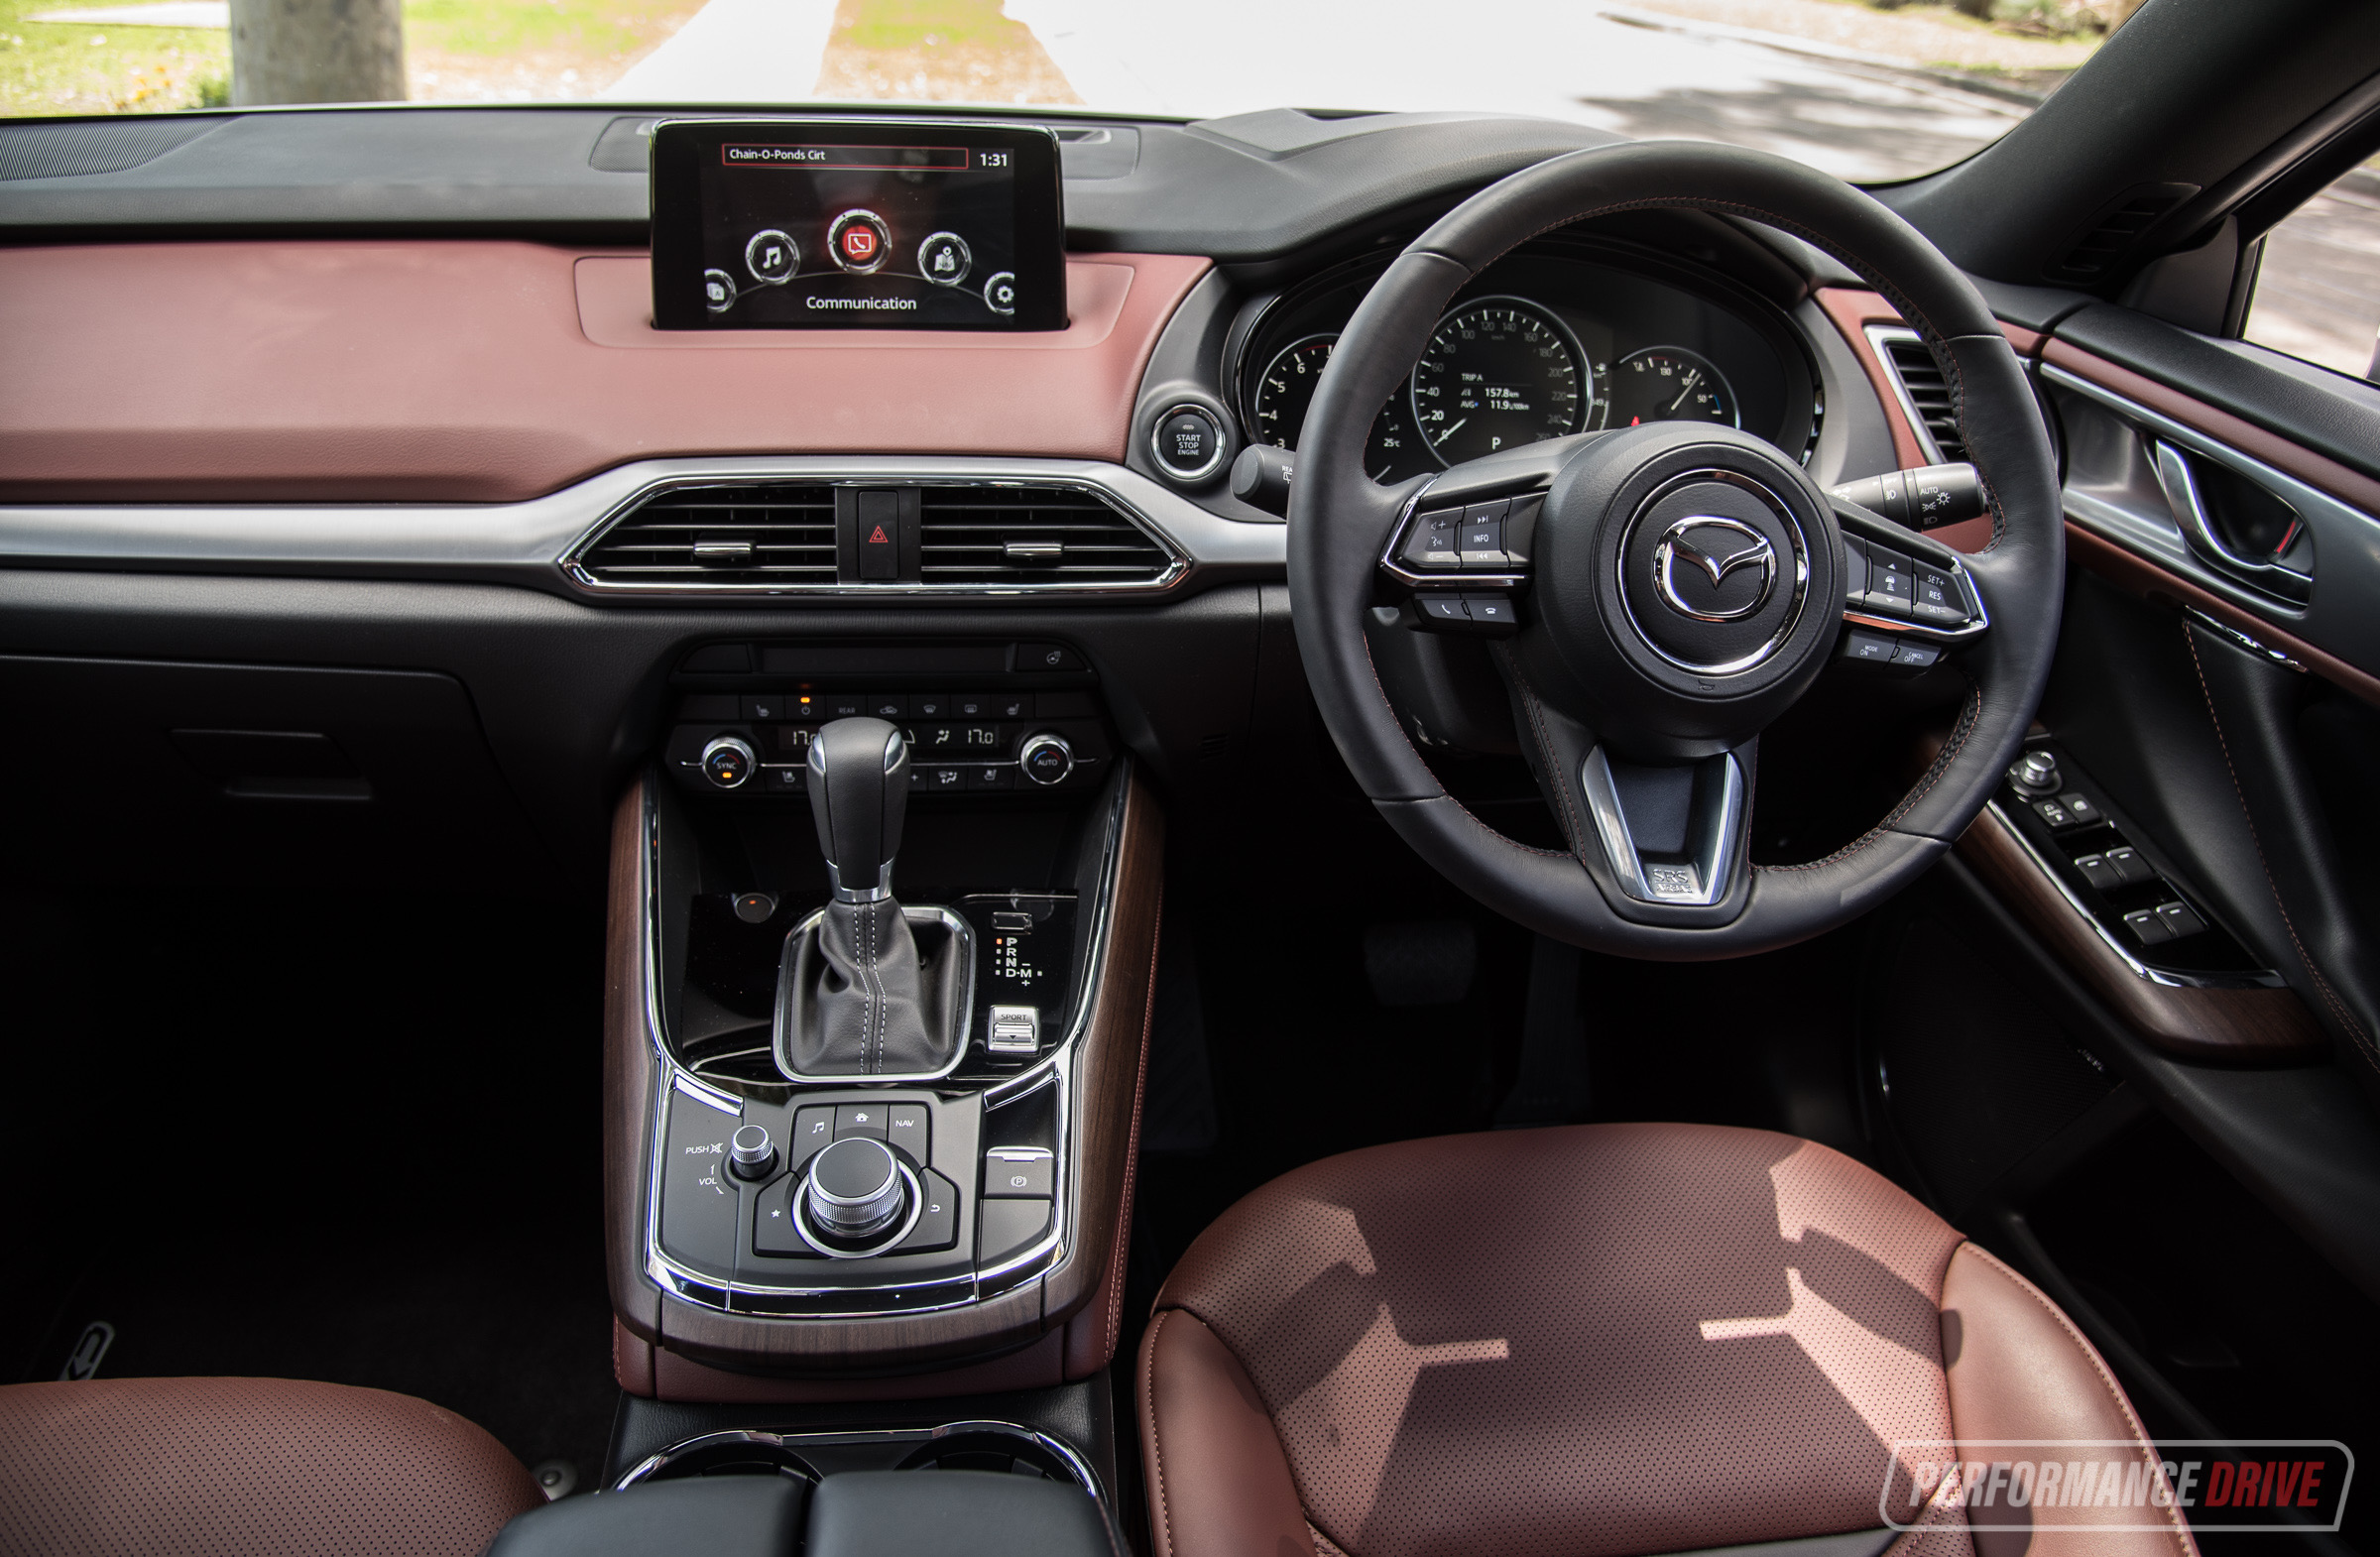 2019 Mazda CX-9 Azami LE review (video) | PerformanceDrive